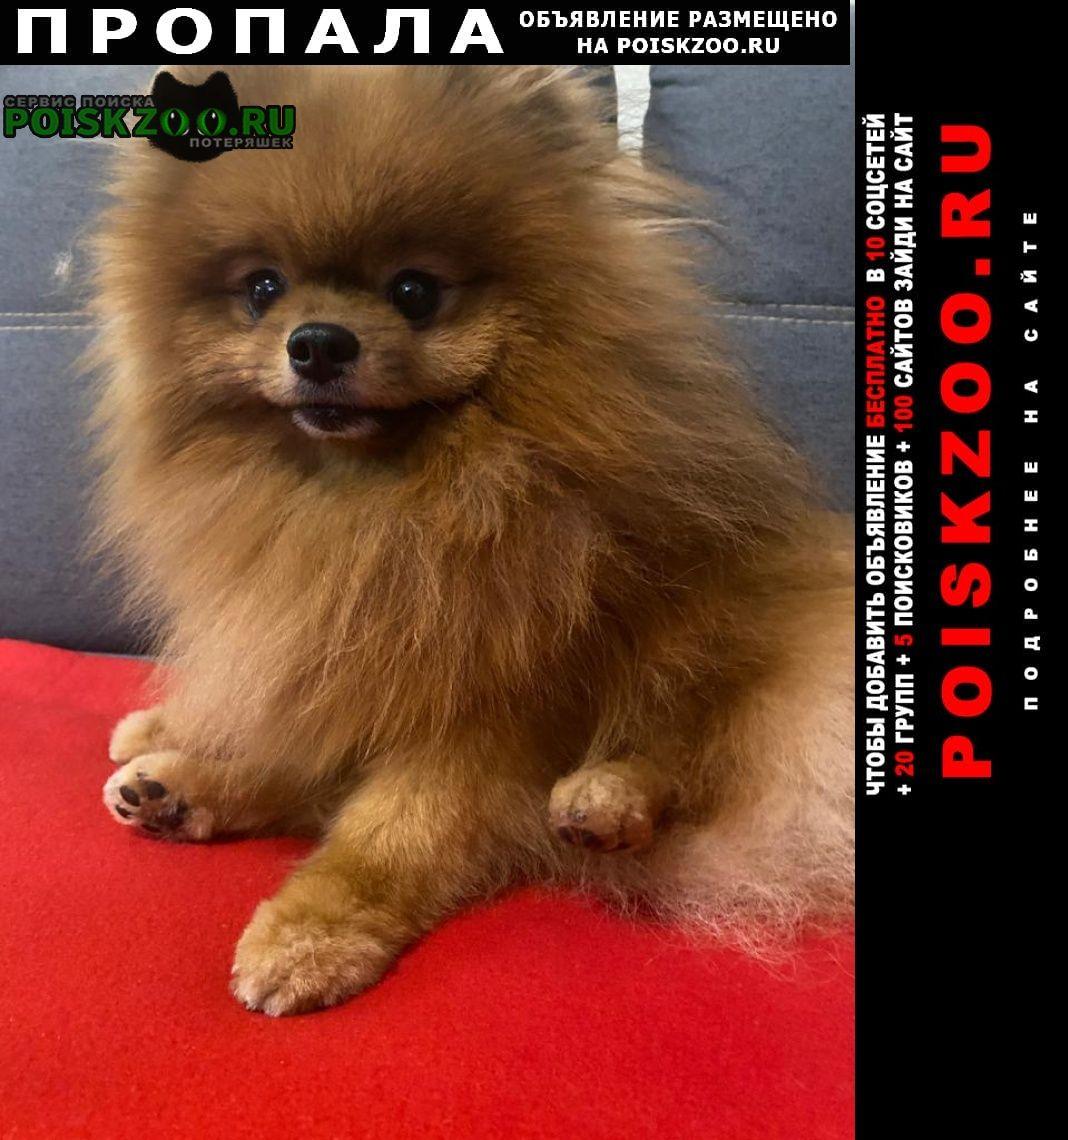 Пропала собака кобель шпиц Екатеринбург